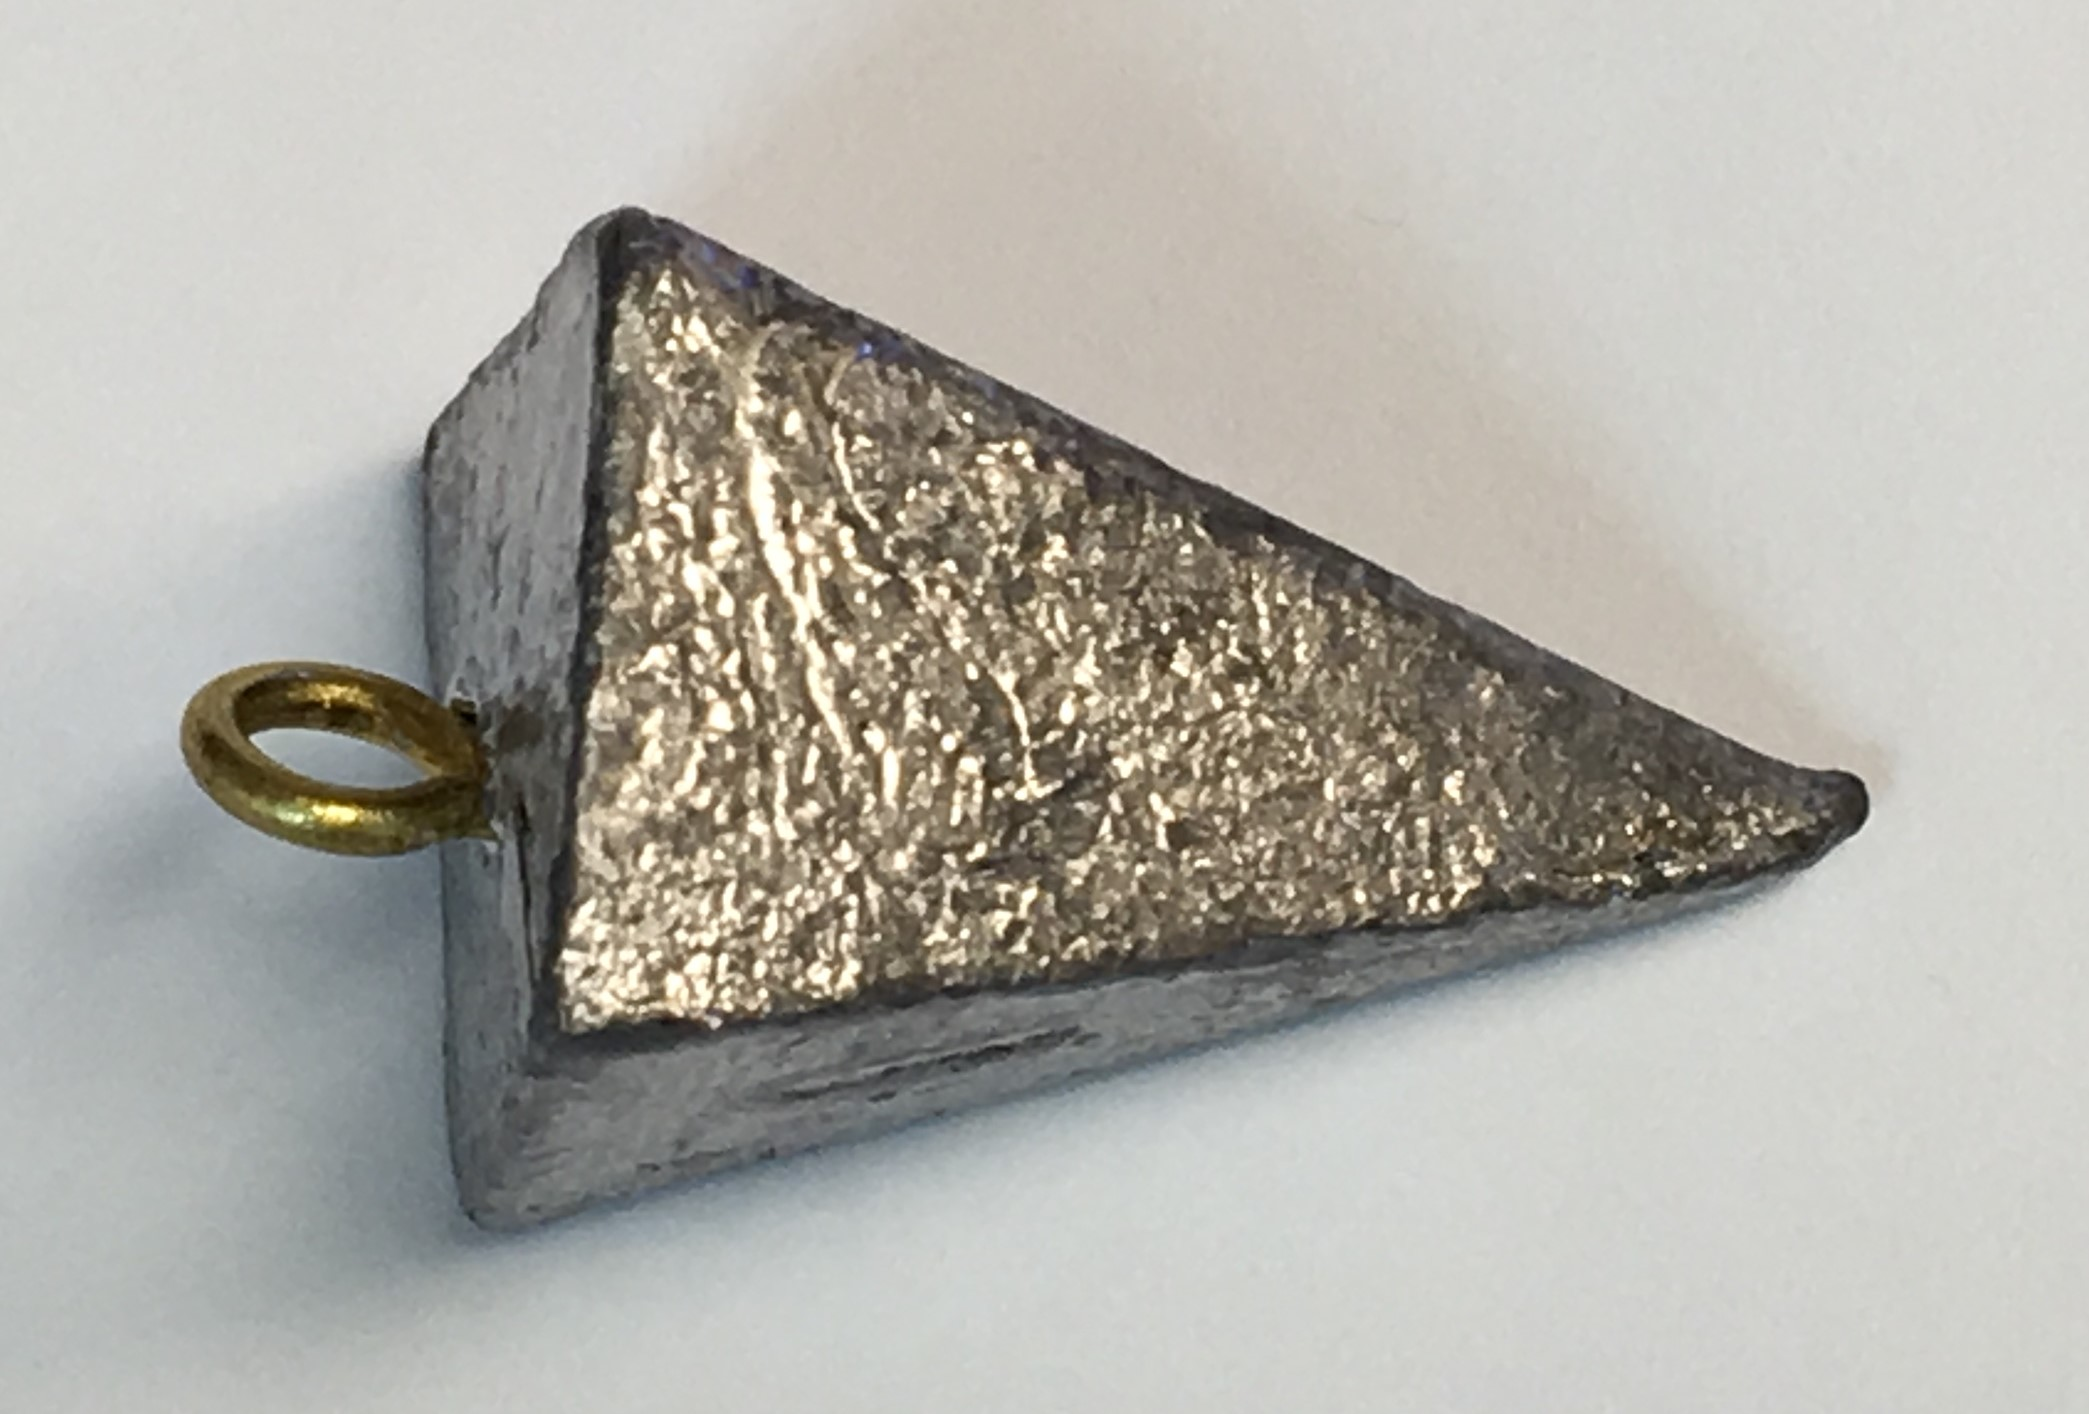 Triangle 4 oz Fishing Sinker Weight Lead